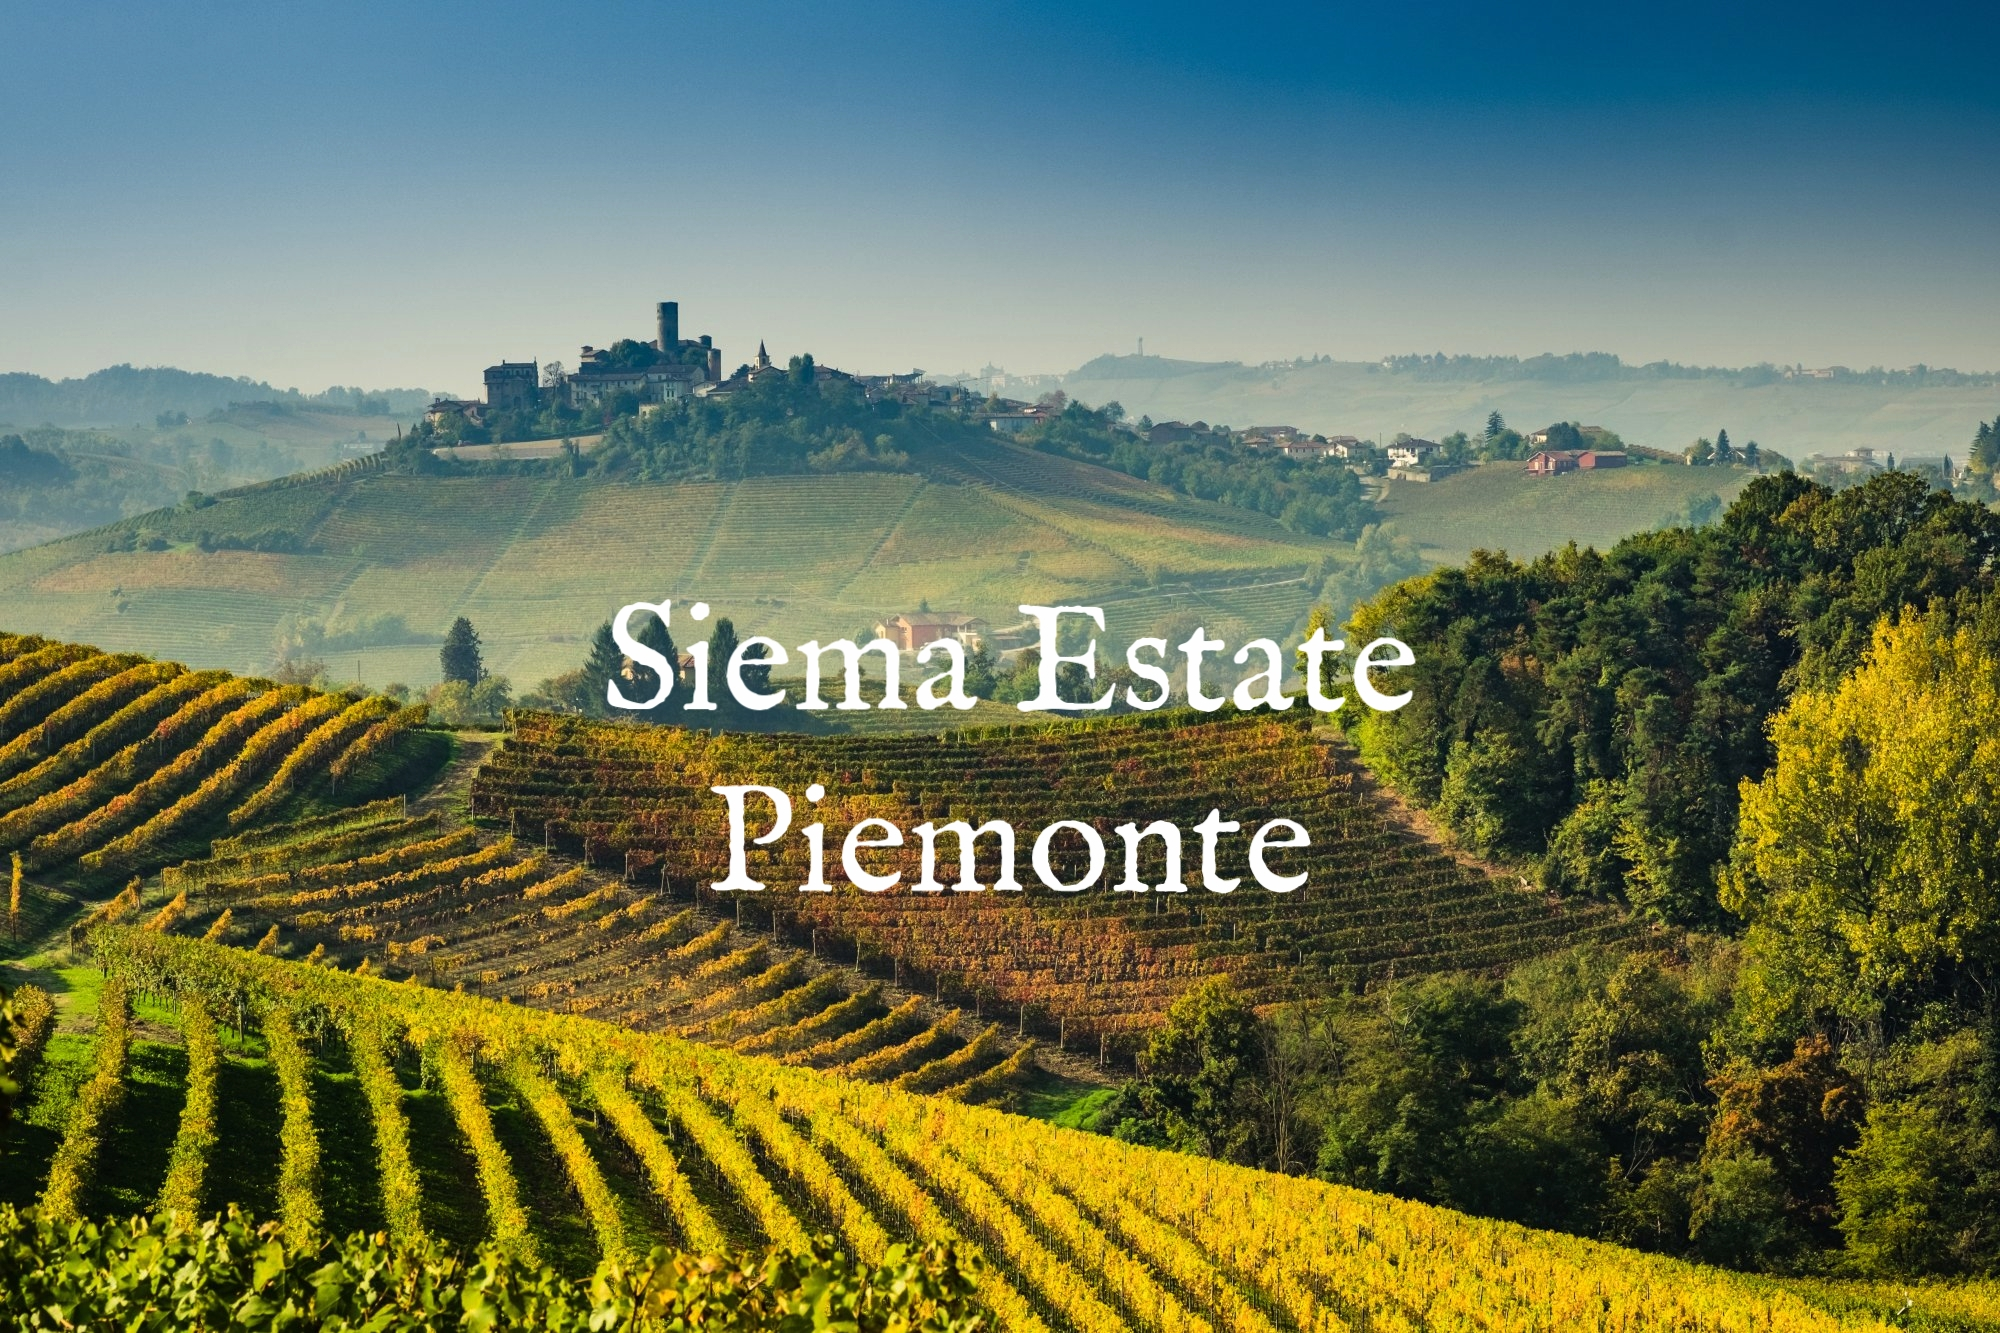 piedmont-vineyards-harvest-e1489160835566.jpg